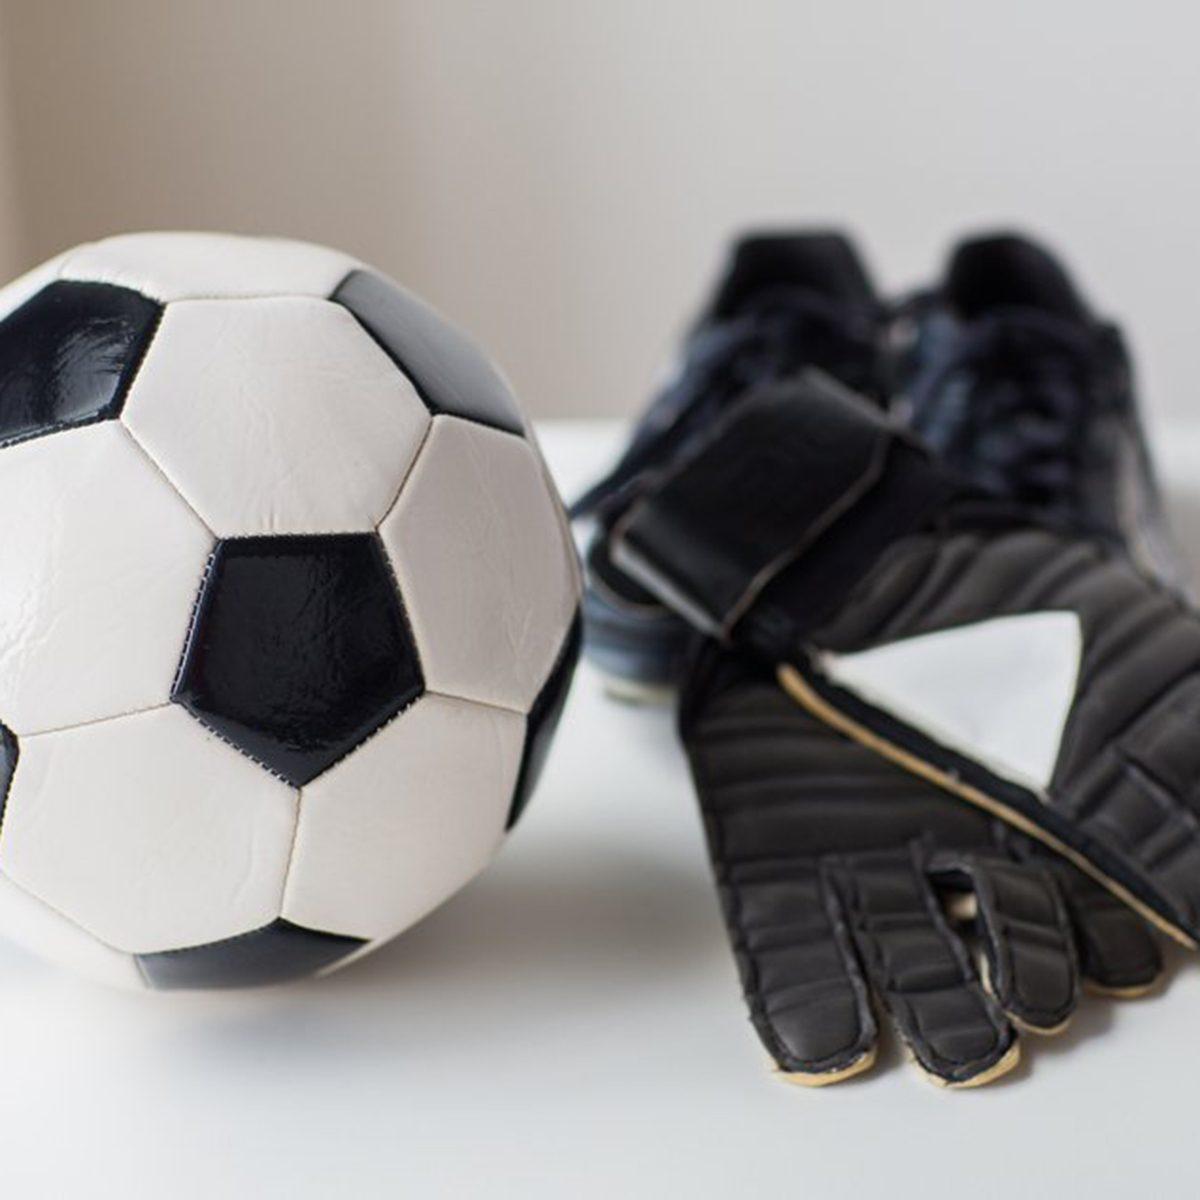 Soccer ball and gloves